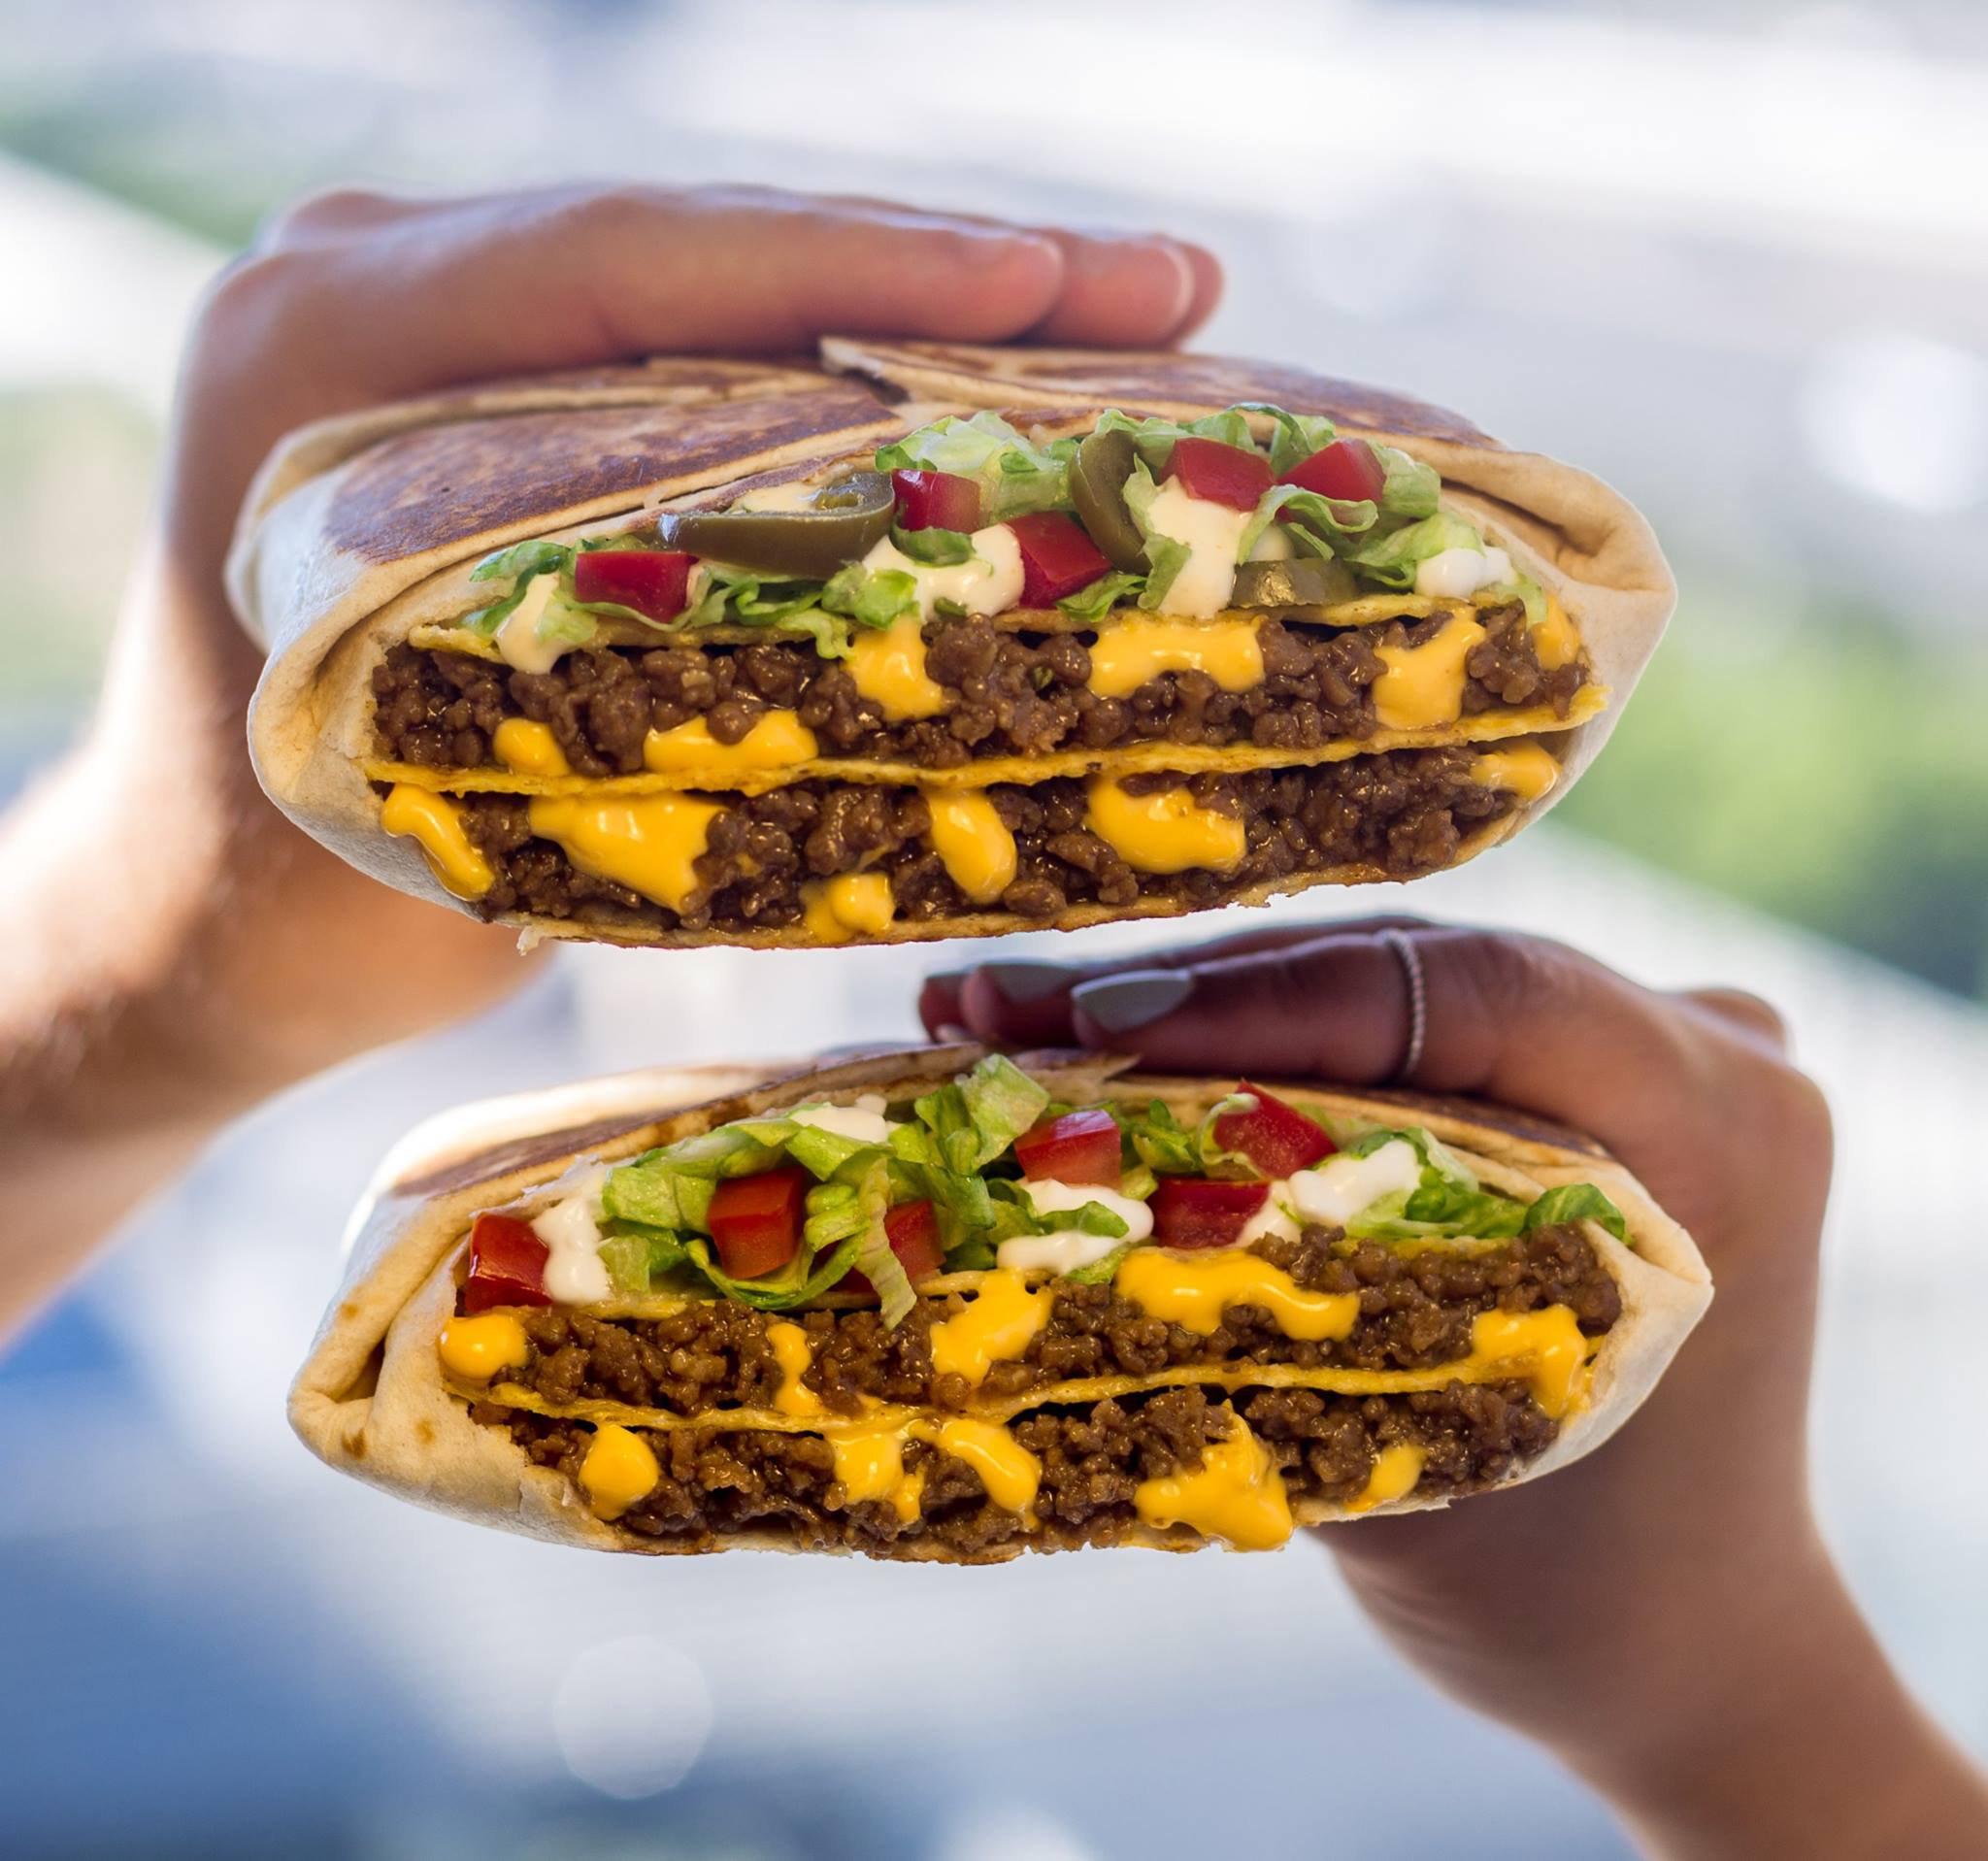 Outstanding Taco Bell Menu Taco Bell Menu Prices Burittos Desserts Quesarito Taco Bell Canada Quesarito Taco Bell Uk nice food Quesarito Taco Bell